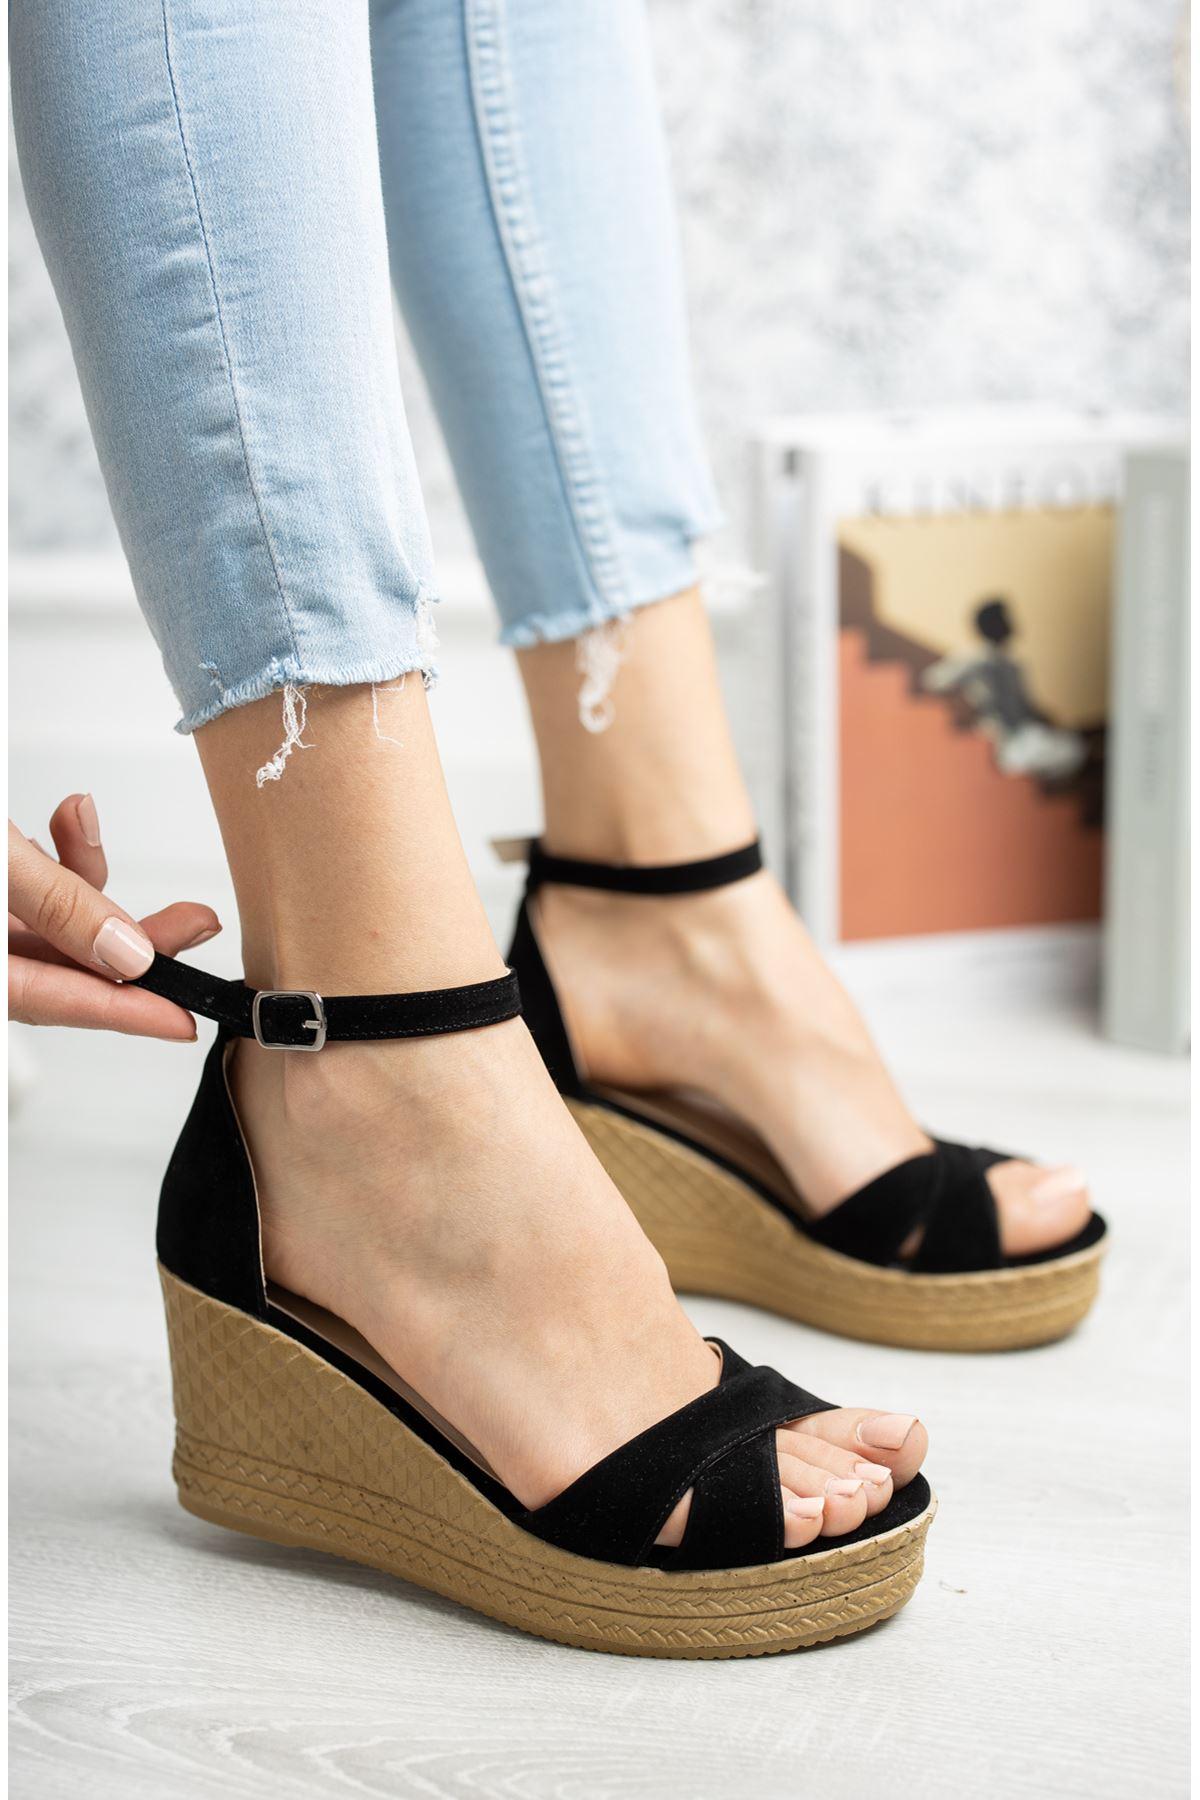 Mantar Taban Çapraz Bant Siyah Süet Sandalet